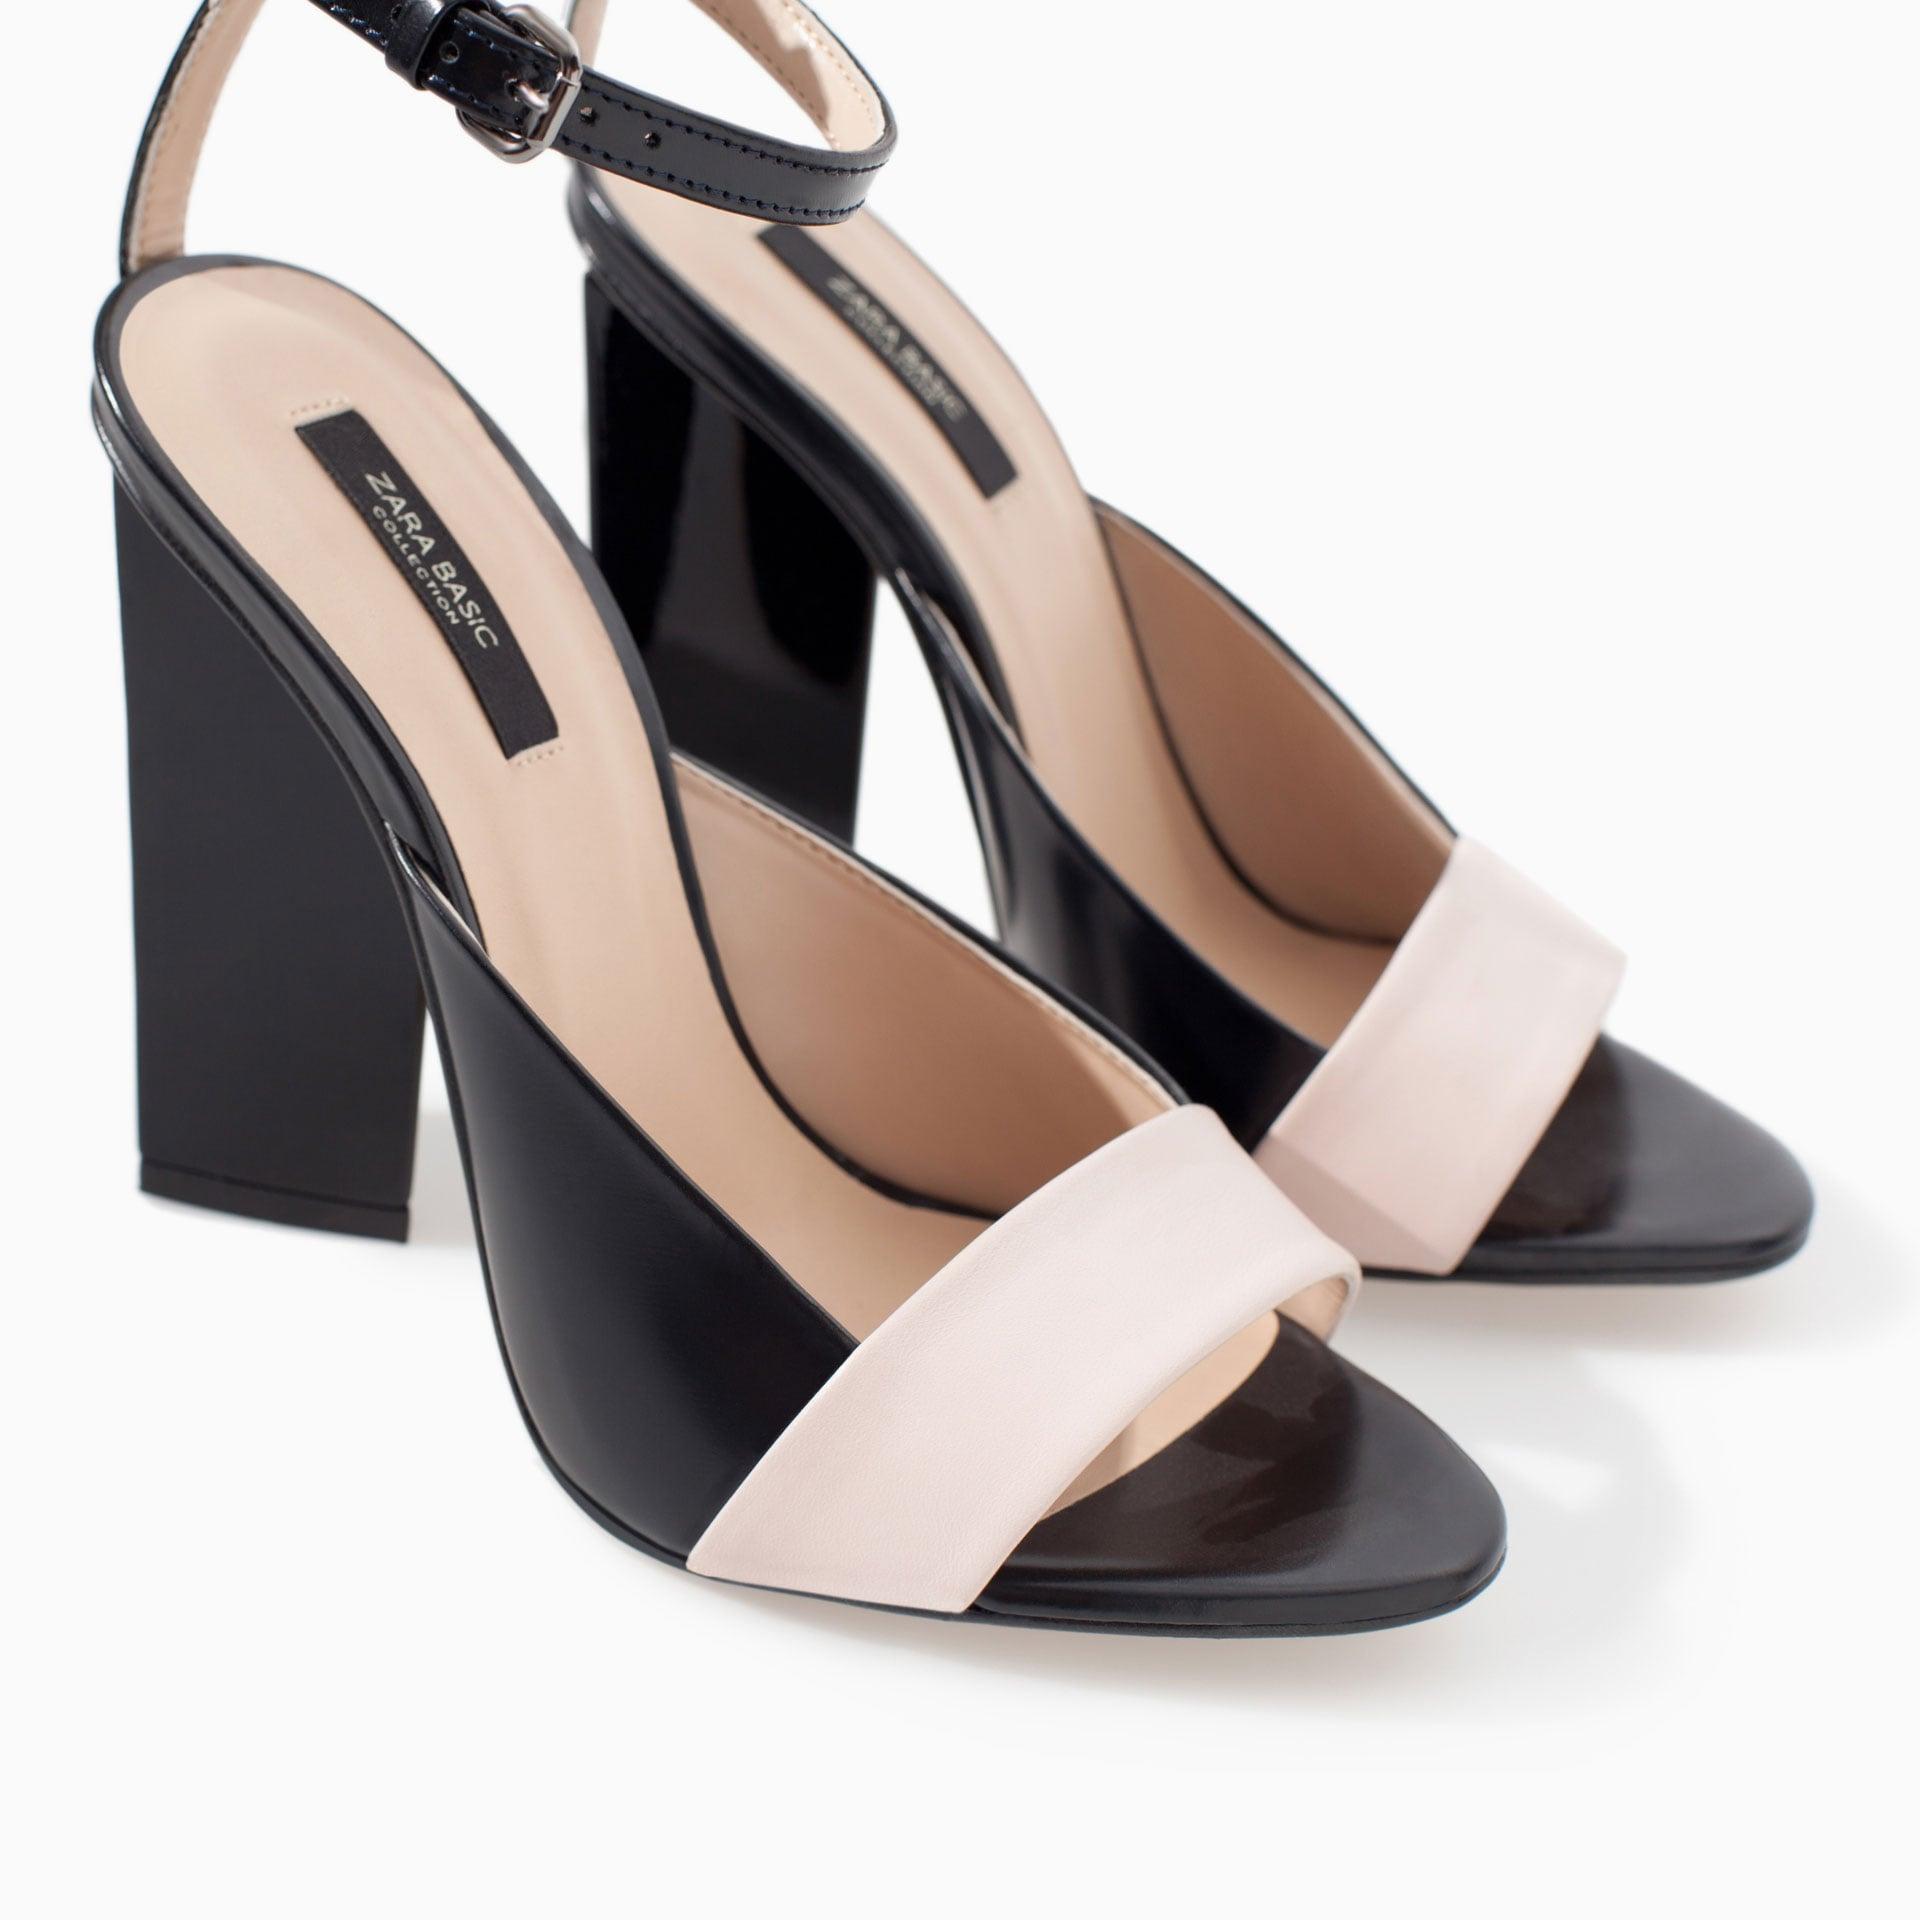 Zara High Heel With Geometric Pattern Sandal ($100)